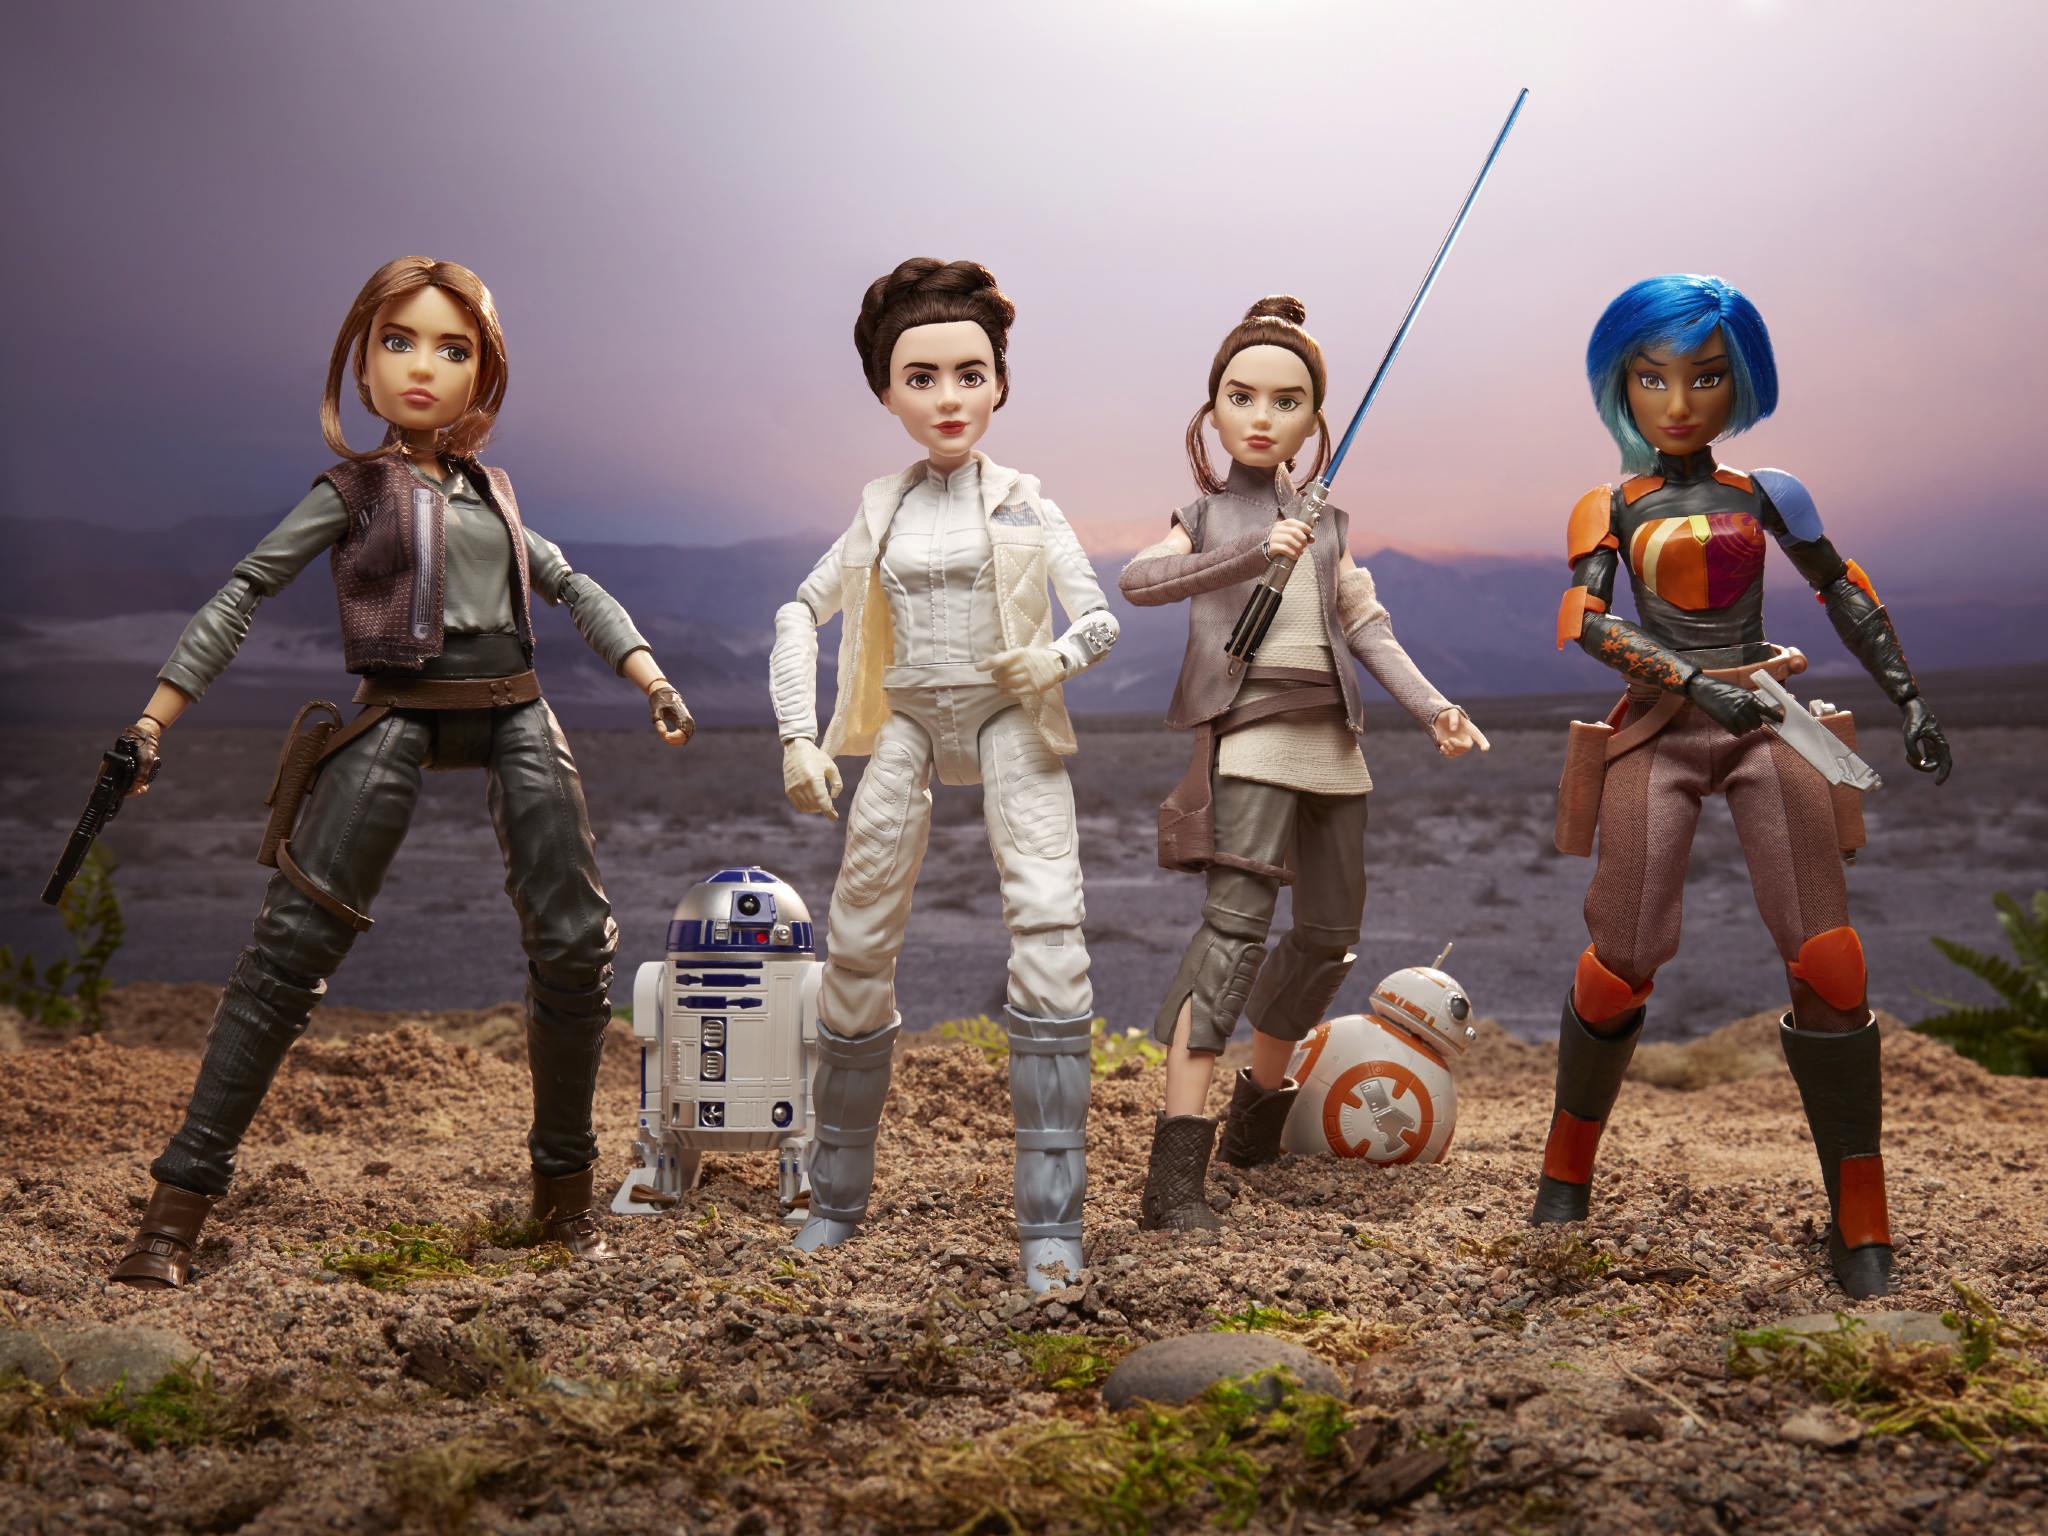 forces-of-destiny-toys.jpg